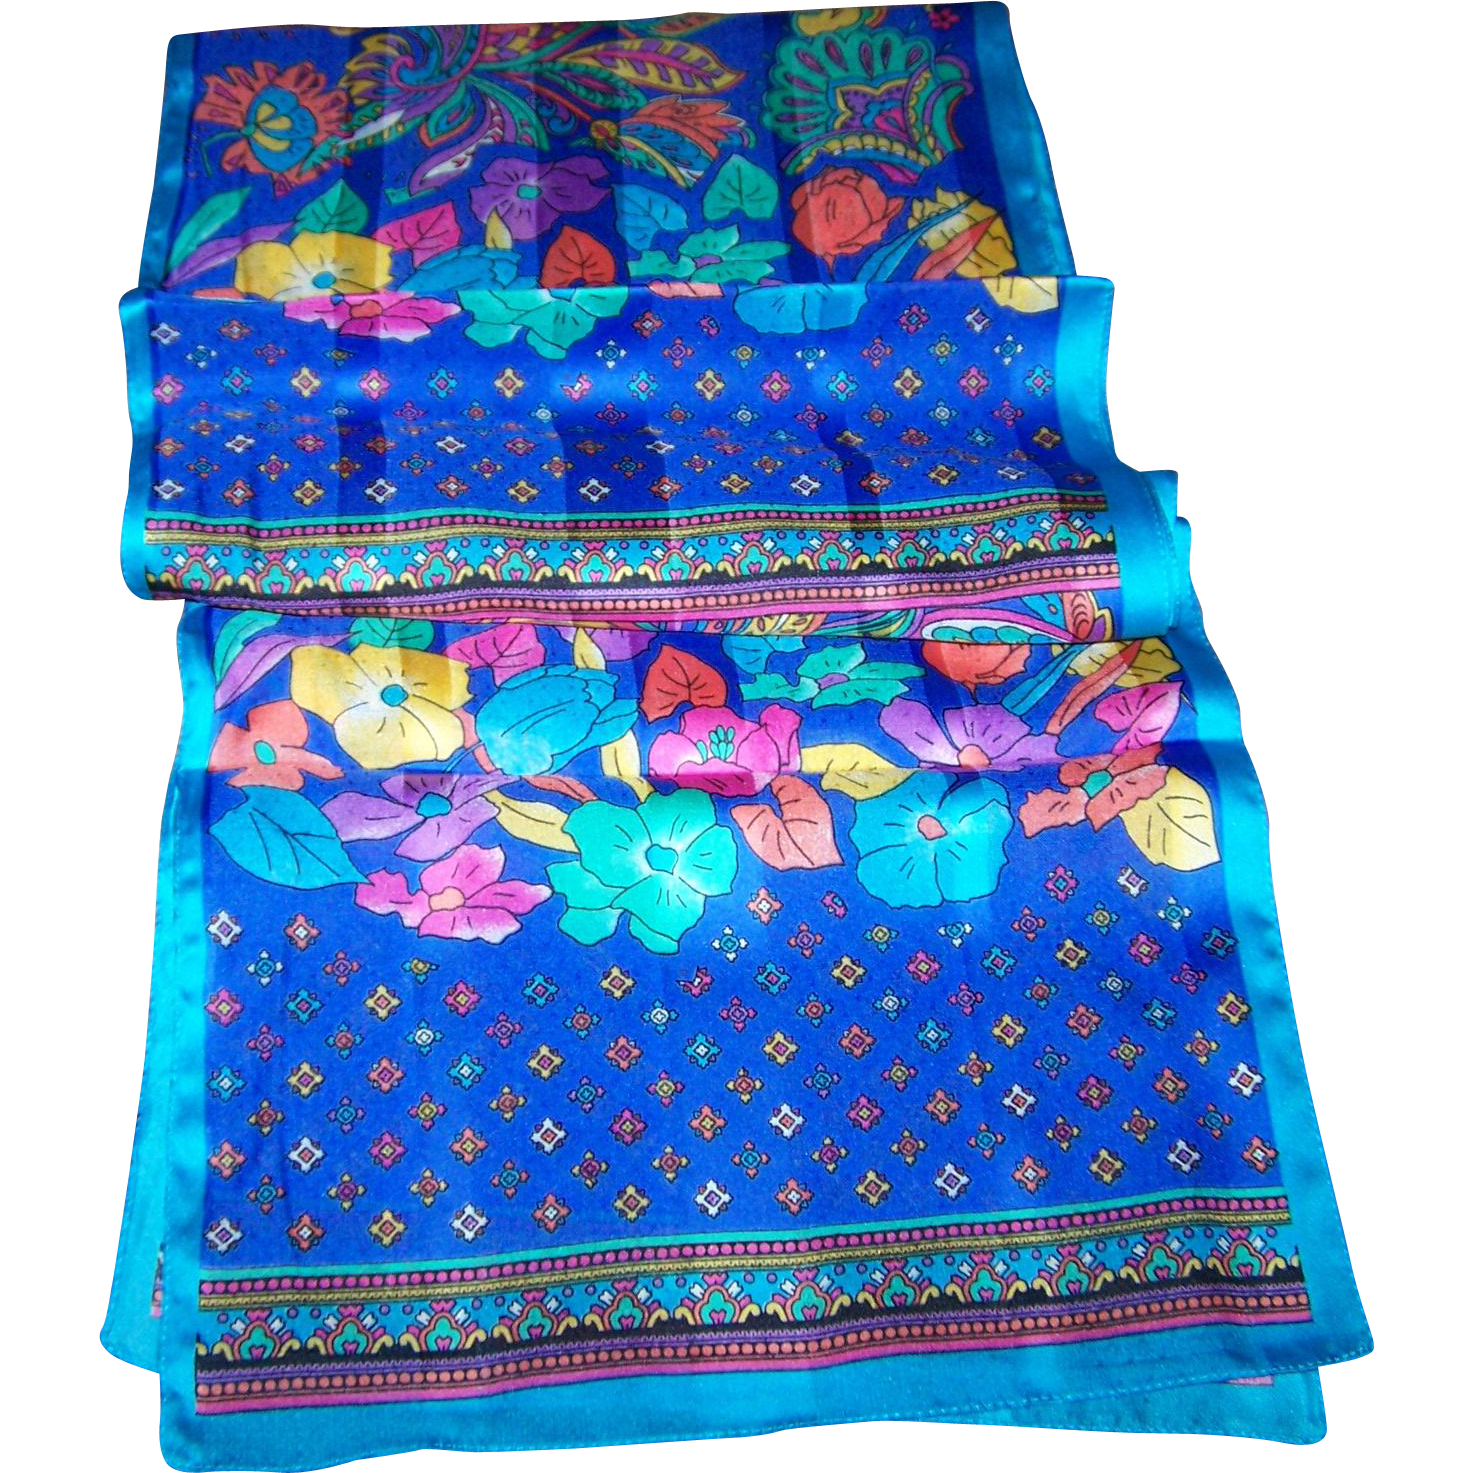 A Beautiful Long Rectangular Mixed Flower Floral Pattern Ladies Fashion Scarf